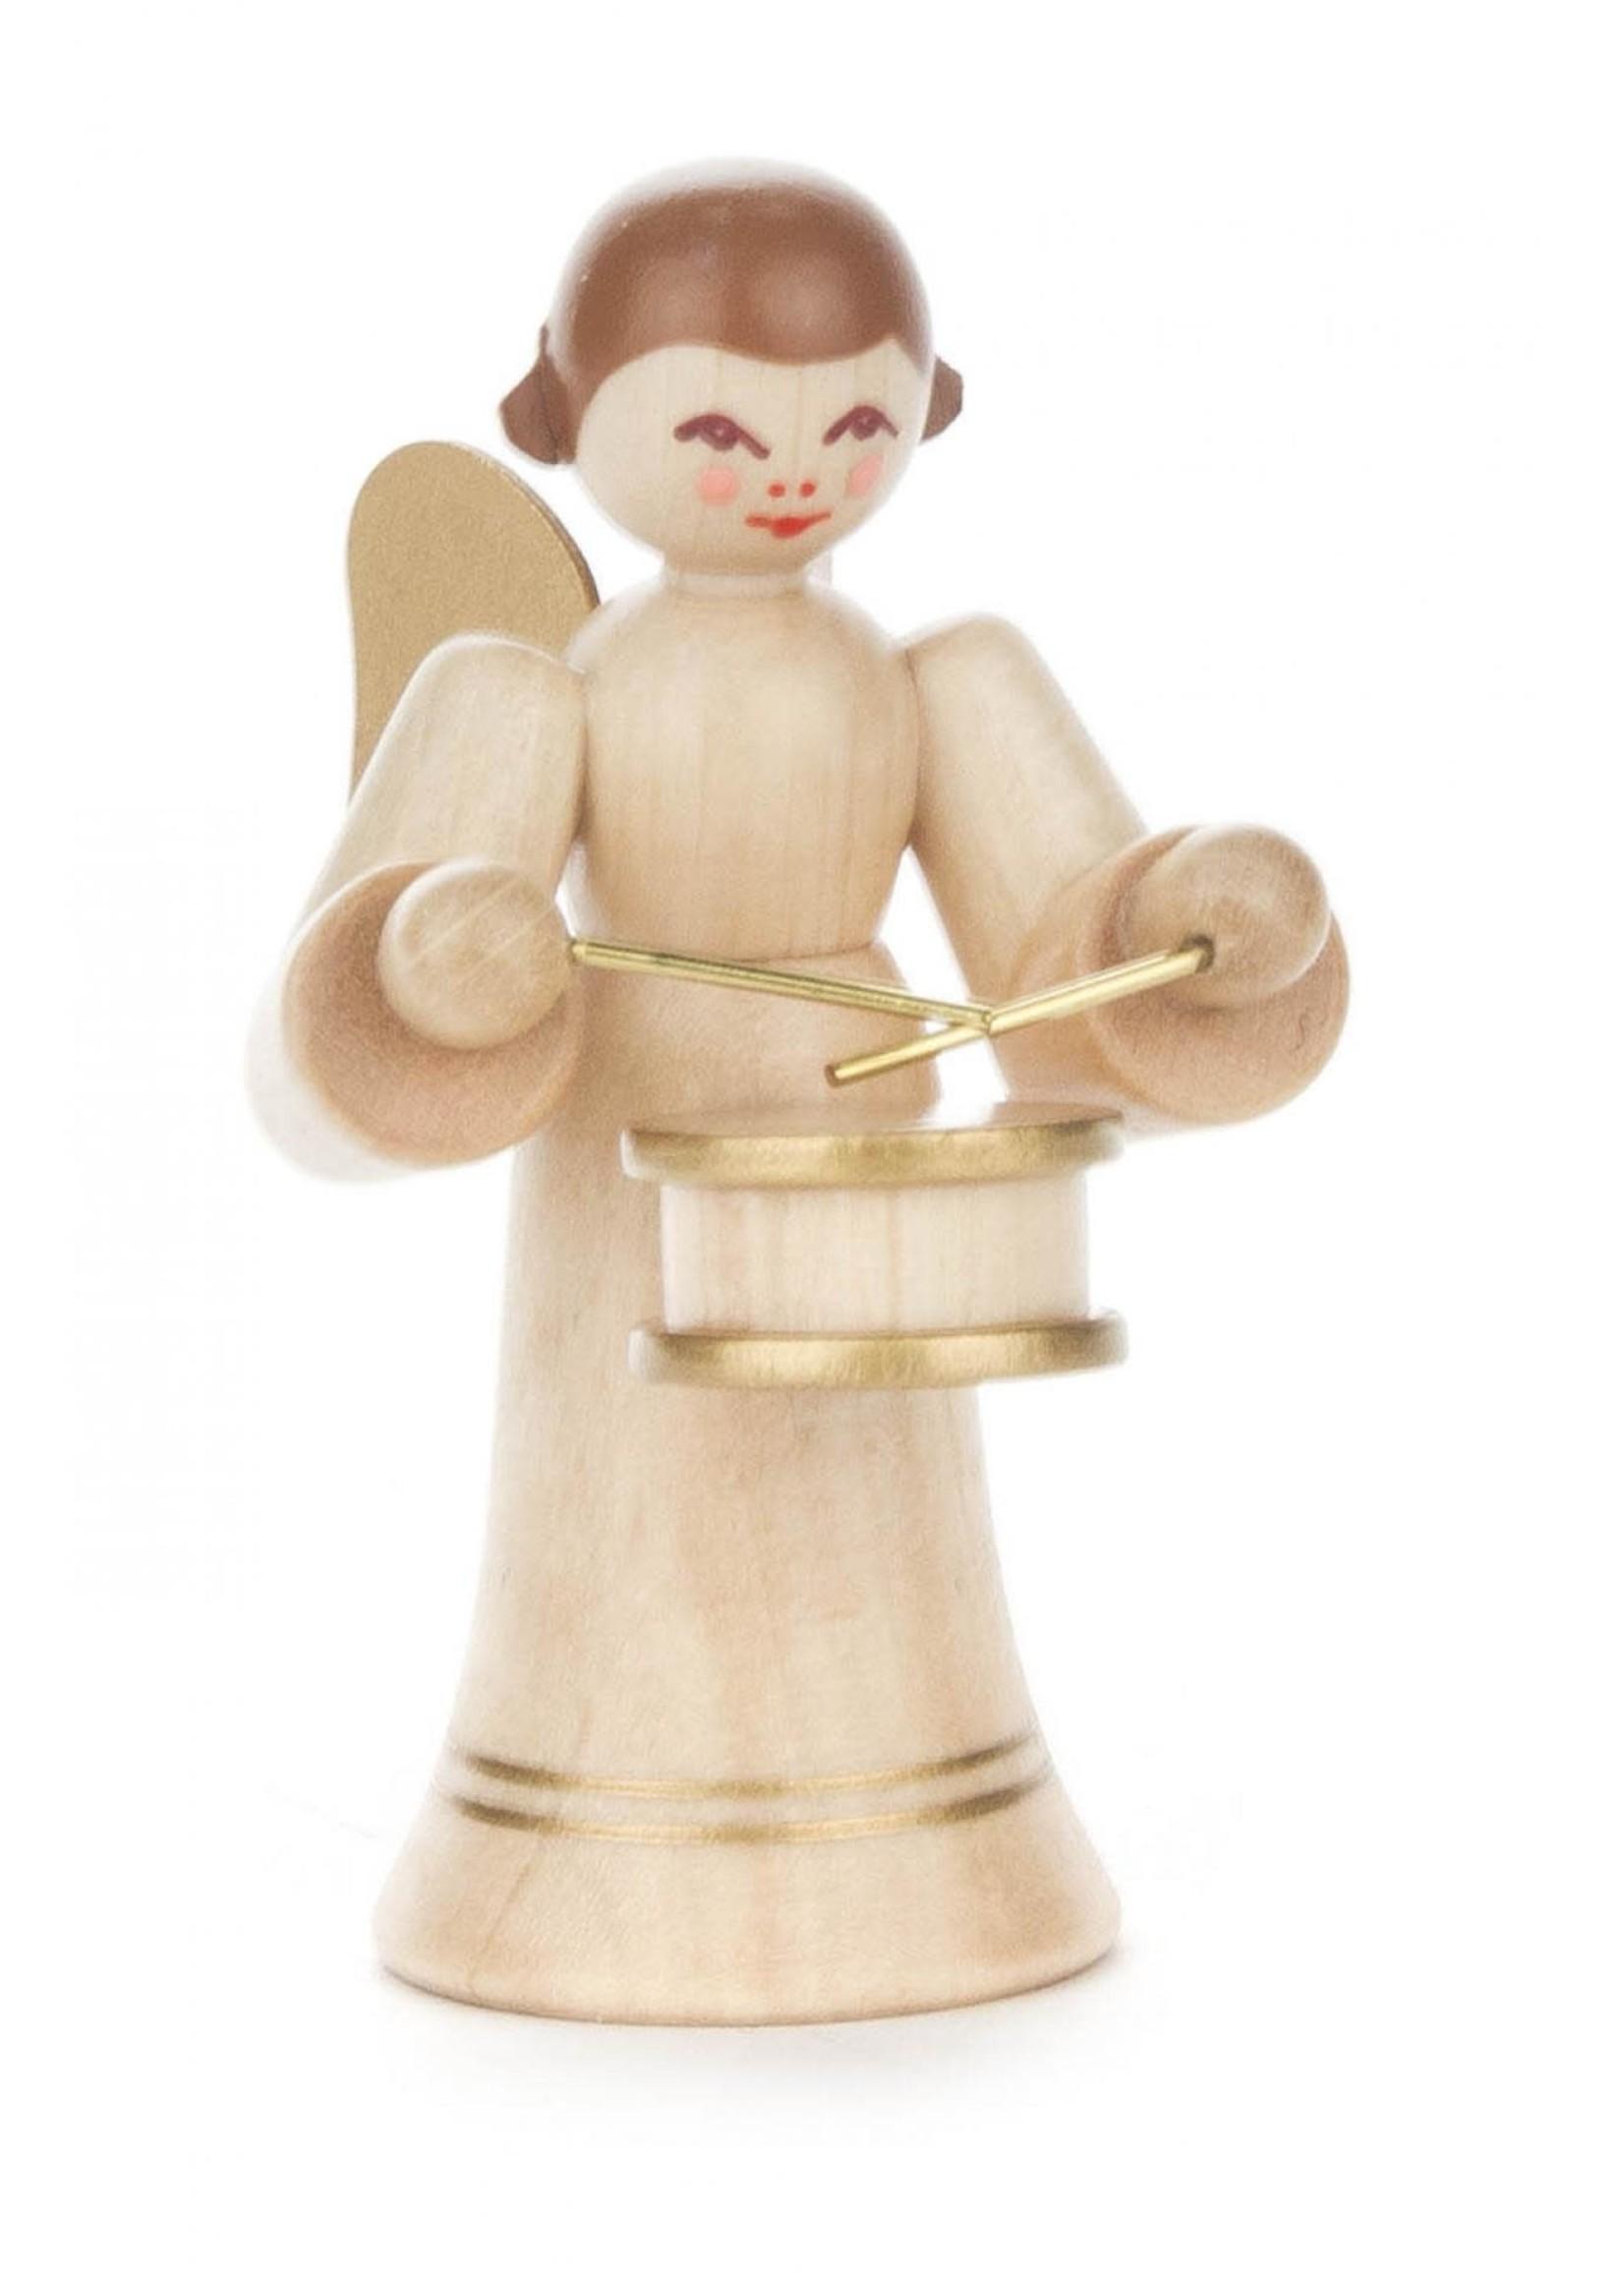 Angel - Long Skirt & Small Drum